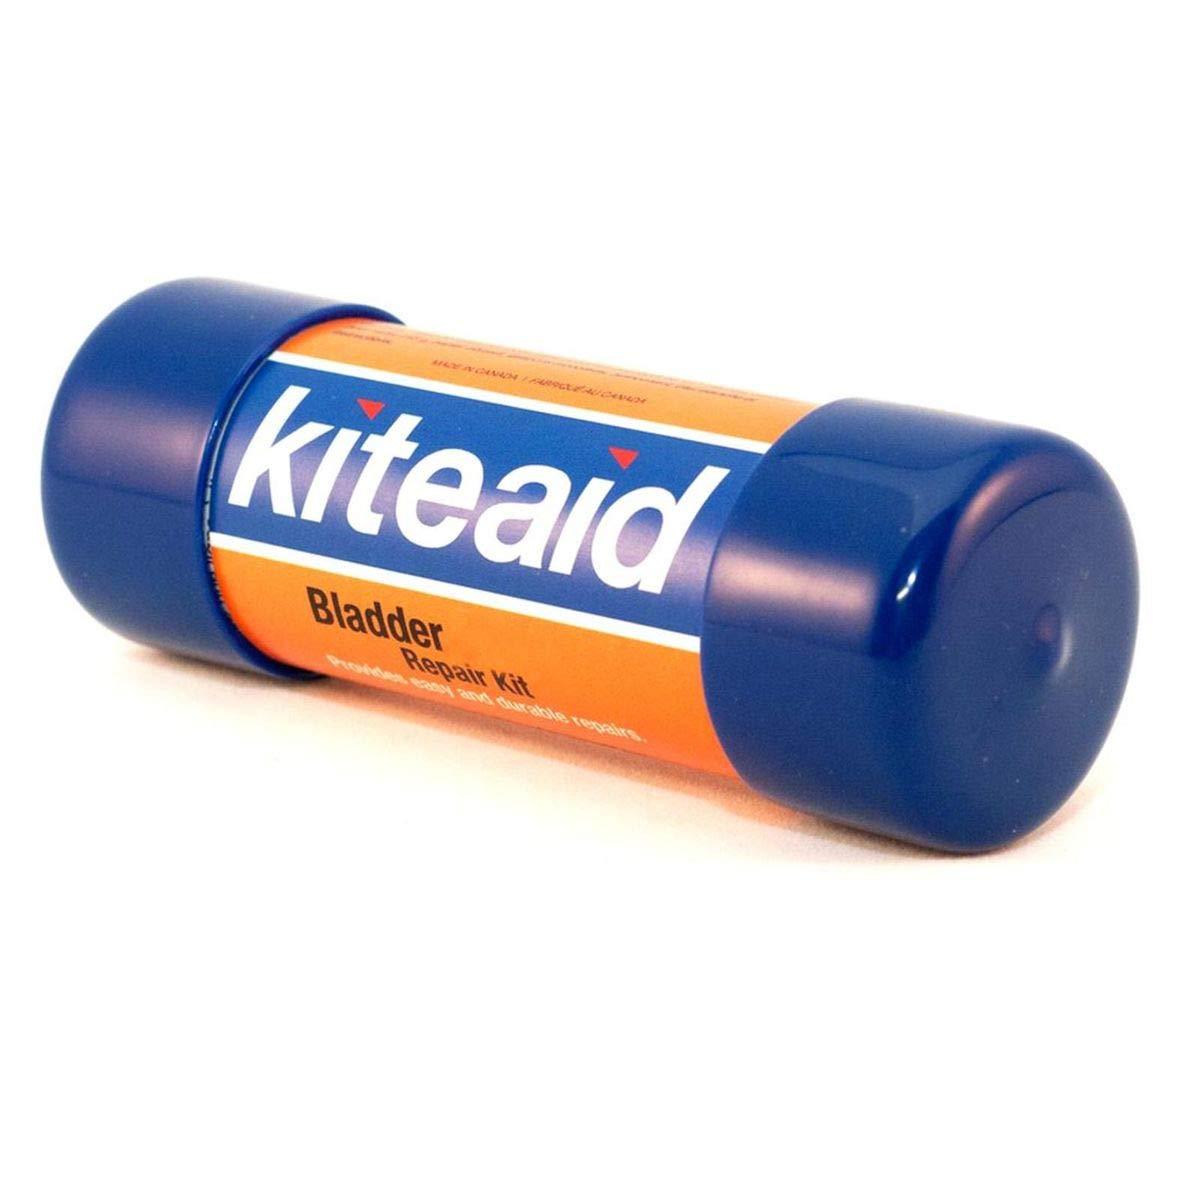 kiteaid Reparaci/ón Kite Bladder Repair Kit